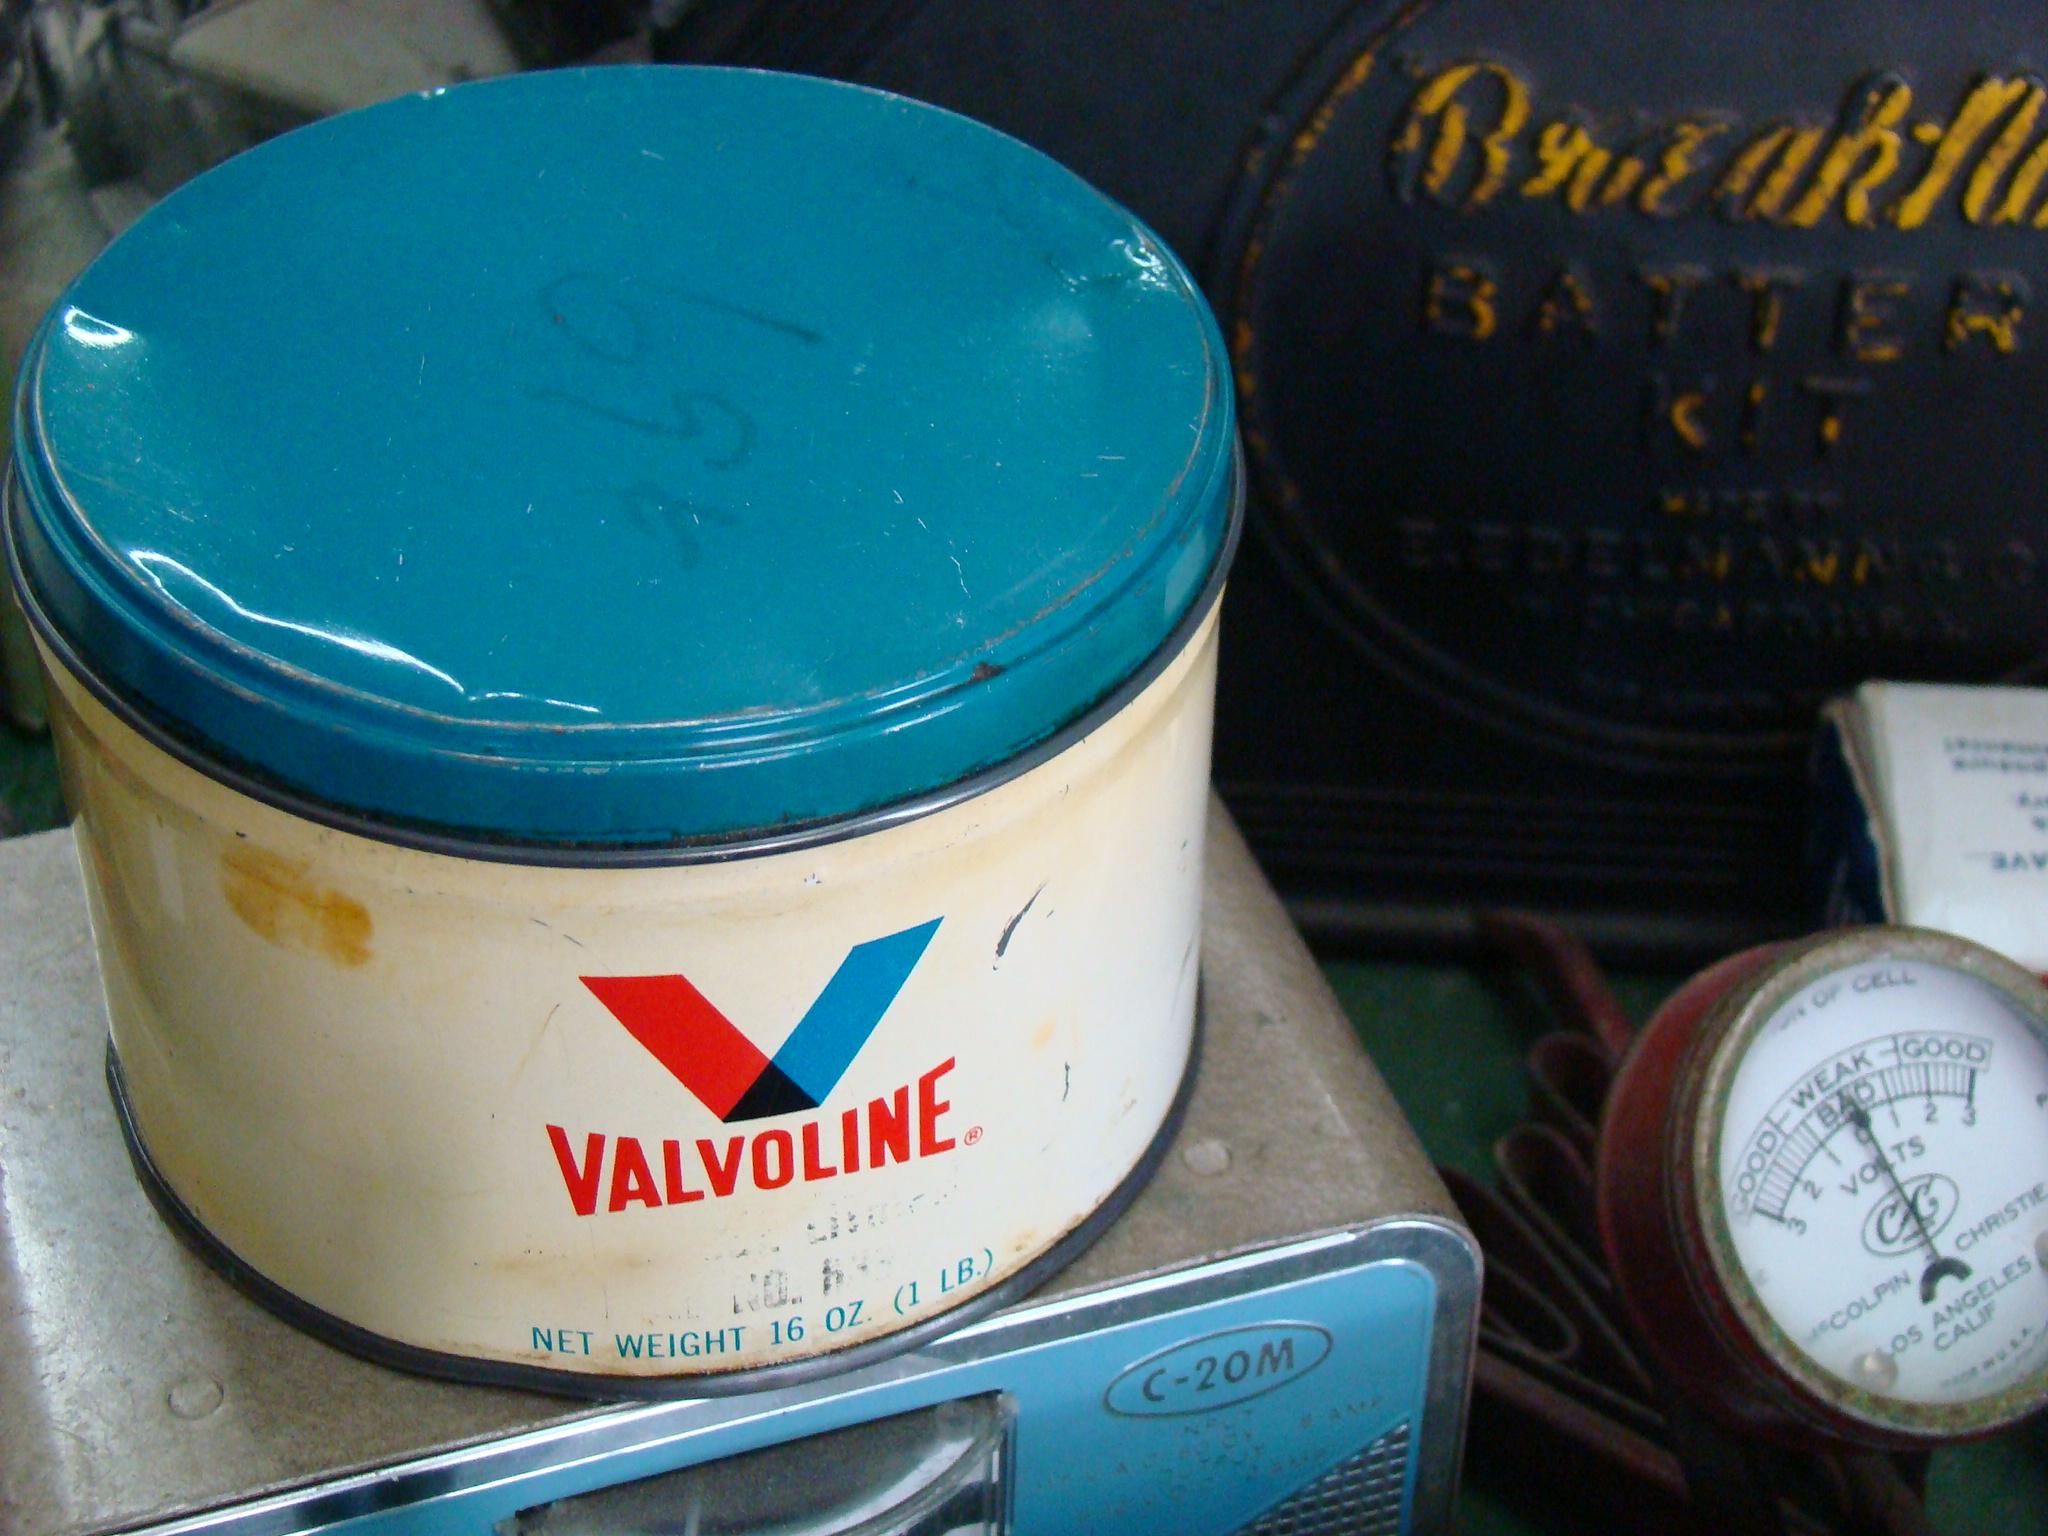 Valvoline Grease Can One Pound 34 FULL   Grumps Garage 2048x1536